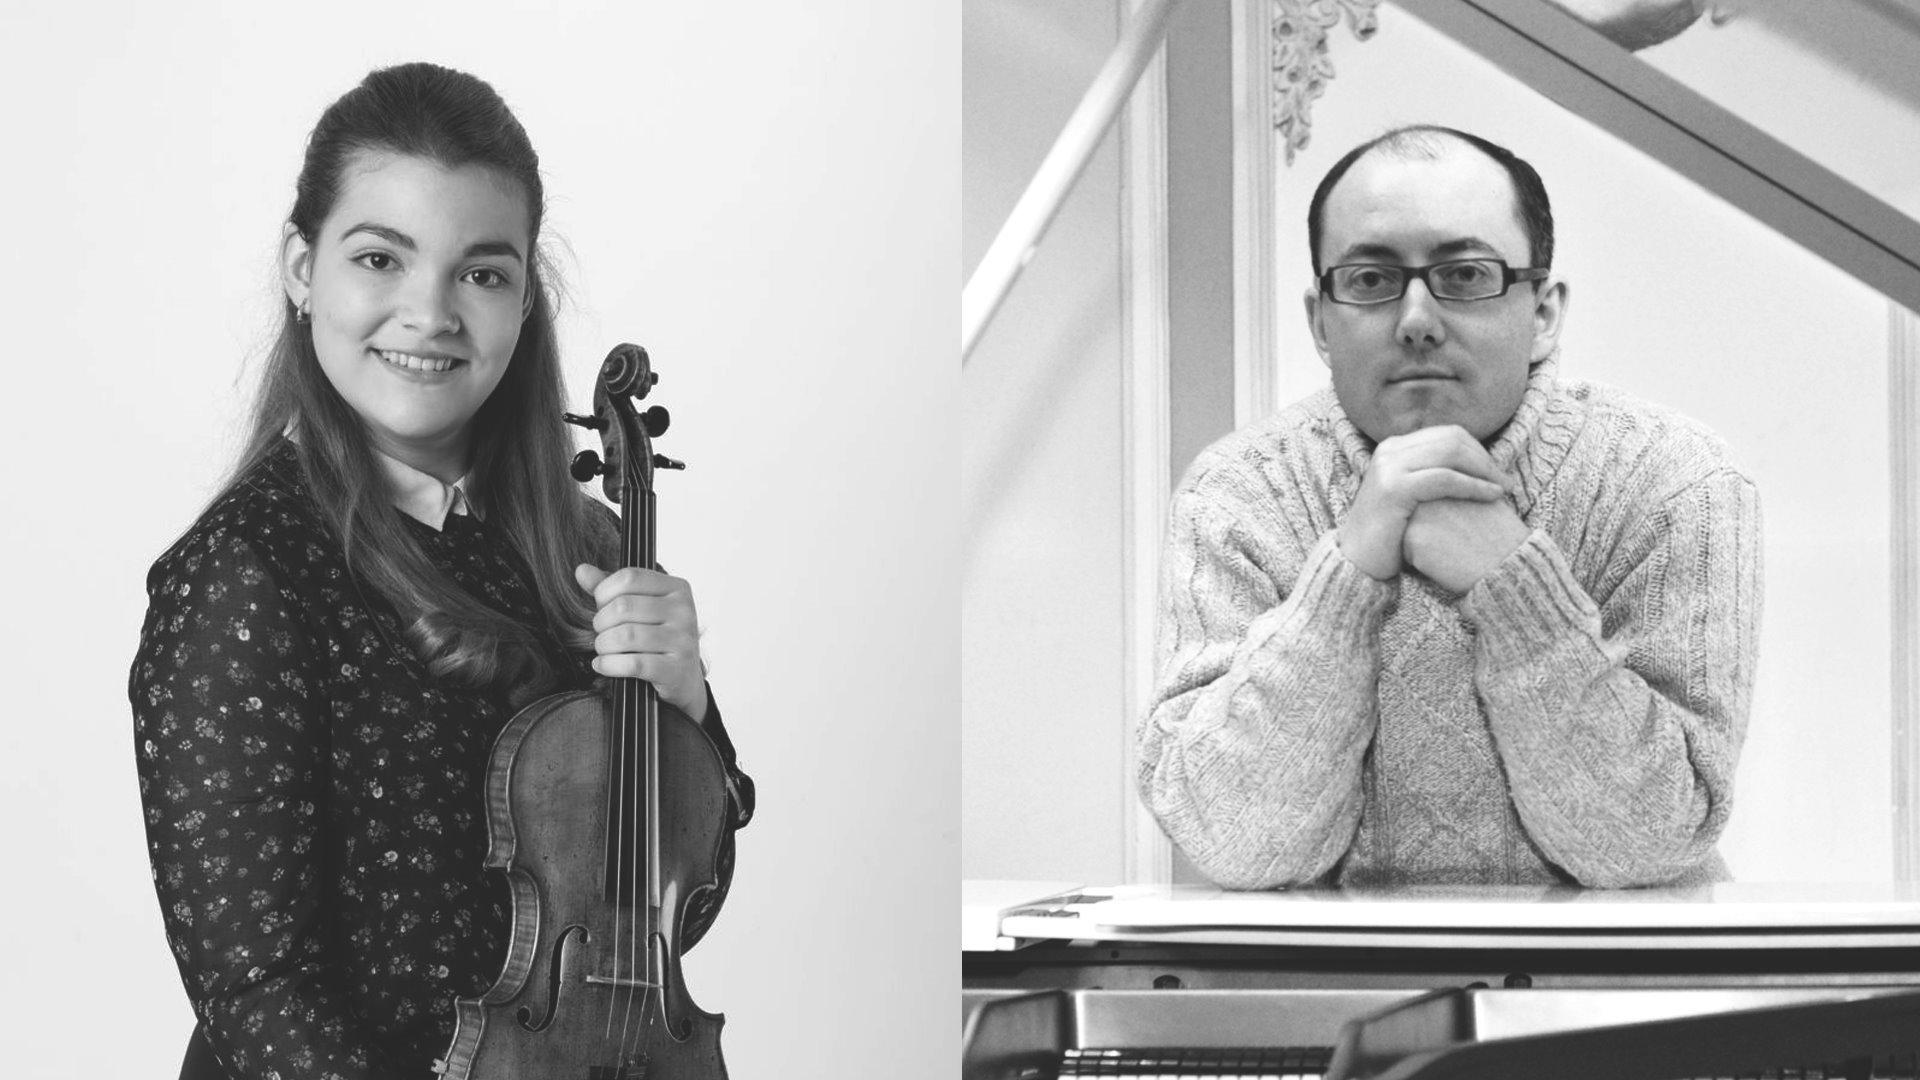 Ellinor D'Melon y Vadim Gladkov